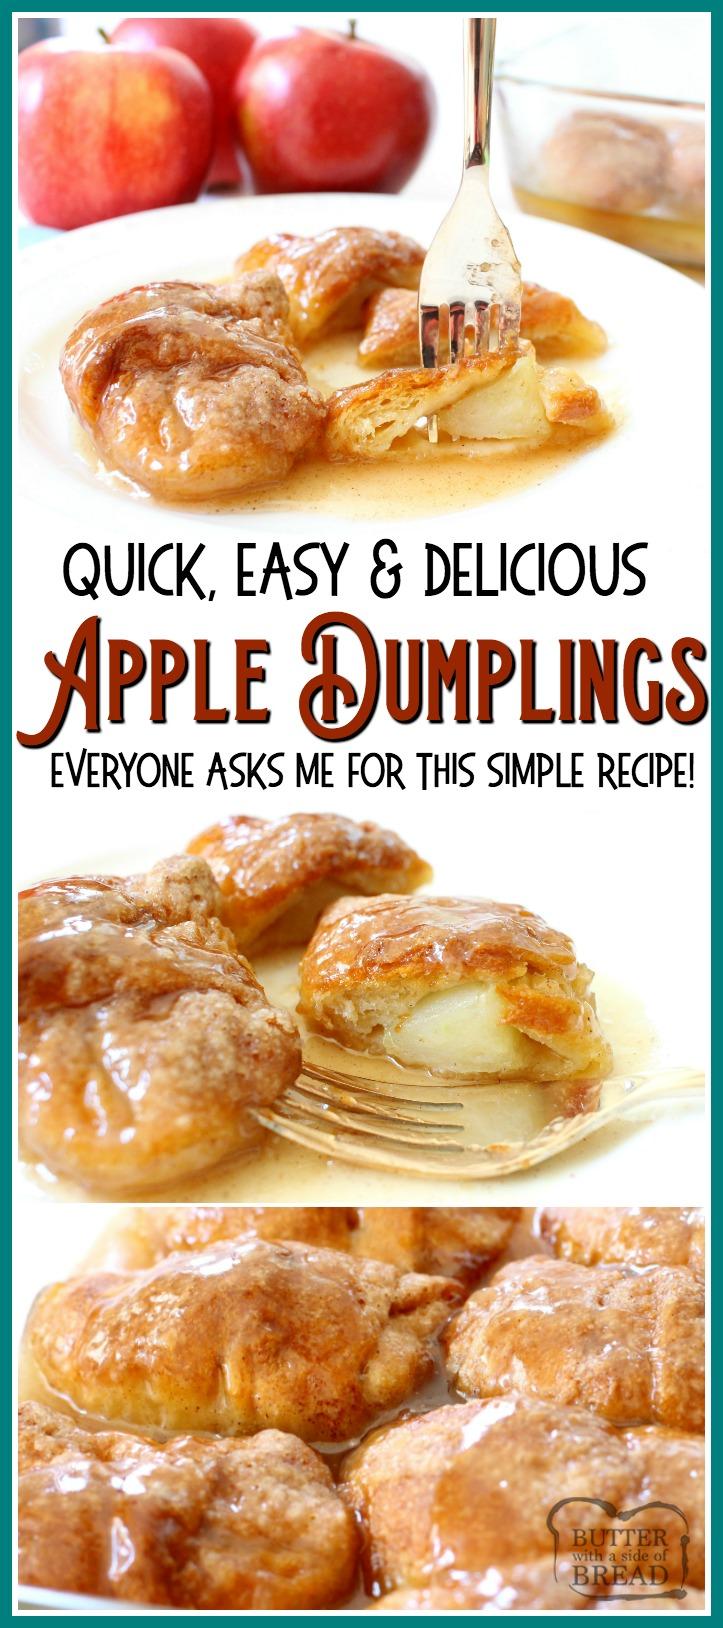 Easy Apple Dumplings recipe made with just a few ingredients- one apple, brown sugar, crescent dough & lemon lime soda! Simple recipe for apple dumplings in a sweet caramel-like glaze that tastes delicious. #apple #dumplings #dessert #apples #baking #recipe from BUTTER WITH A SIDE OF BREAD